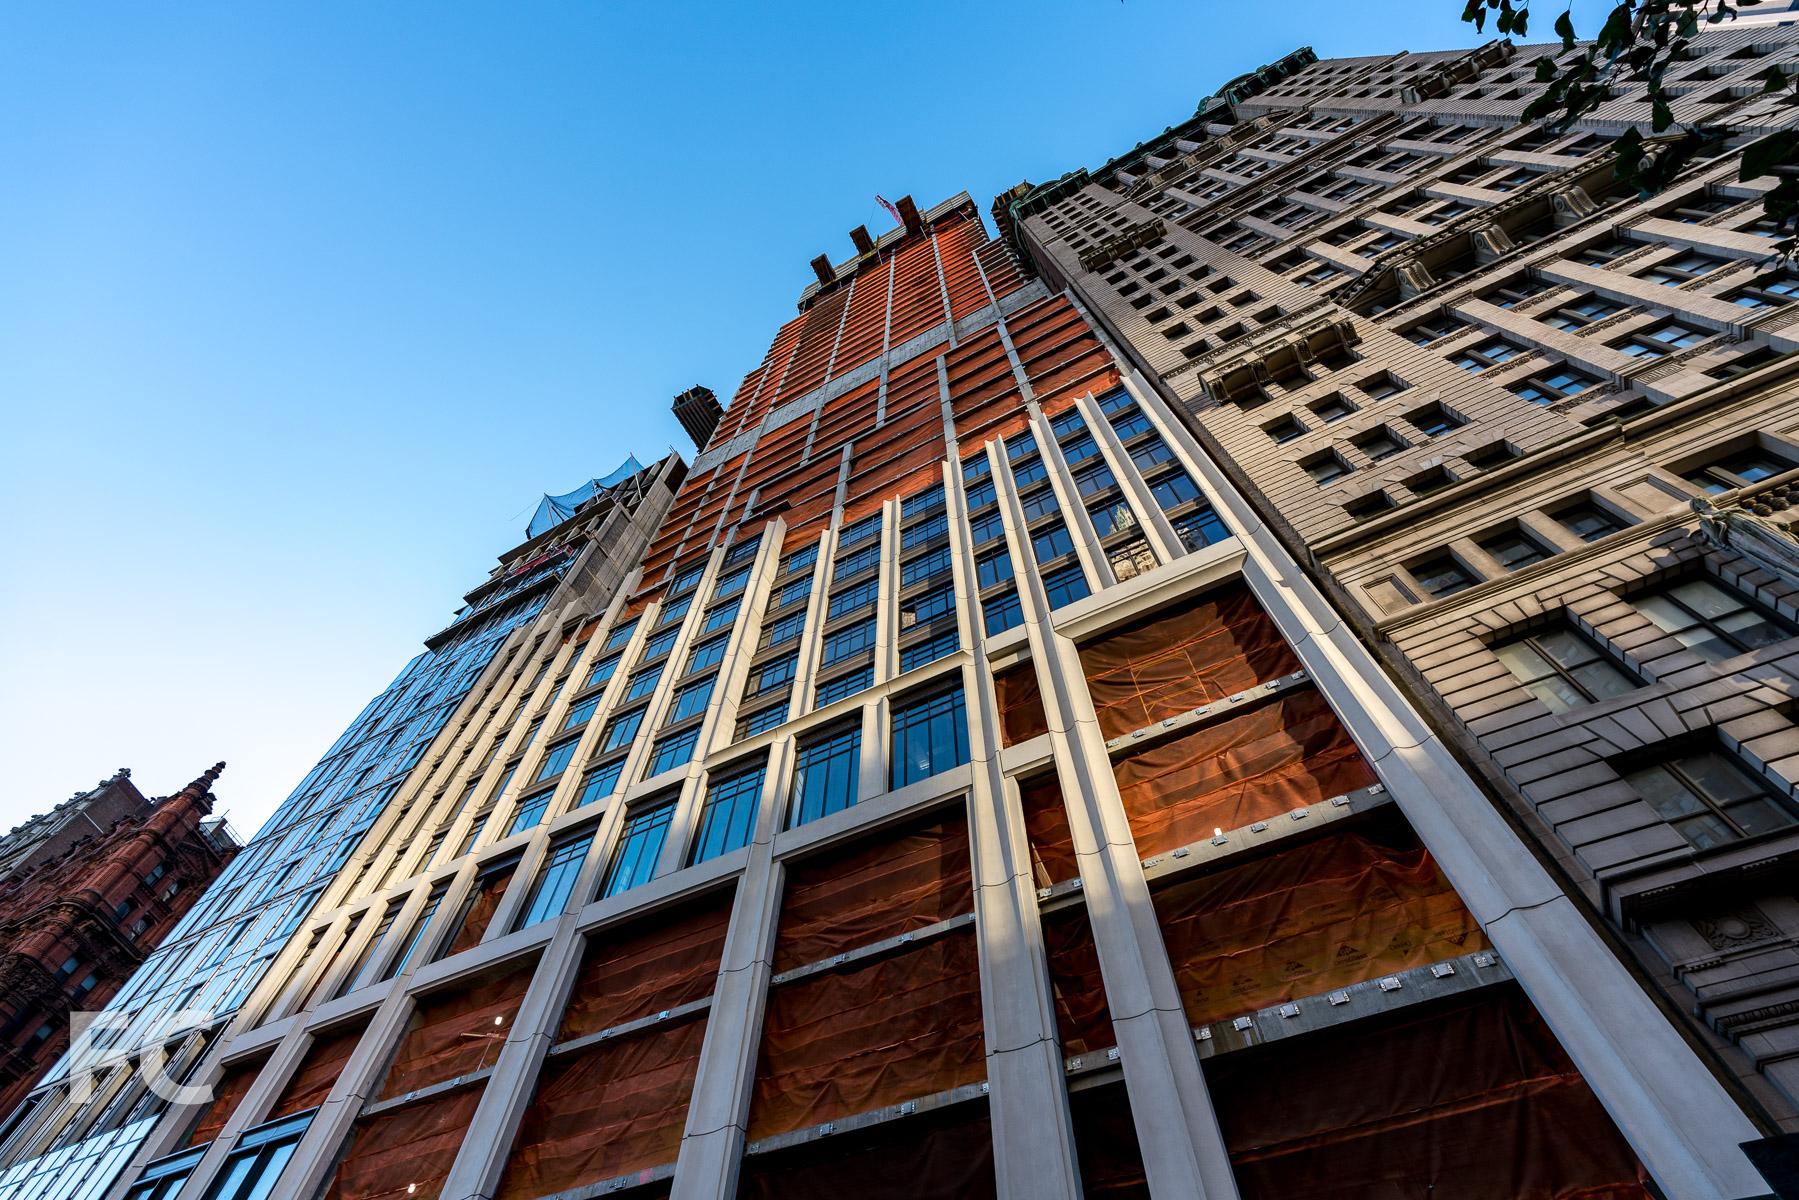 Looking up at the north facade.